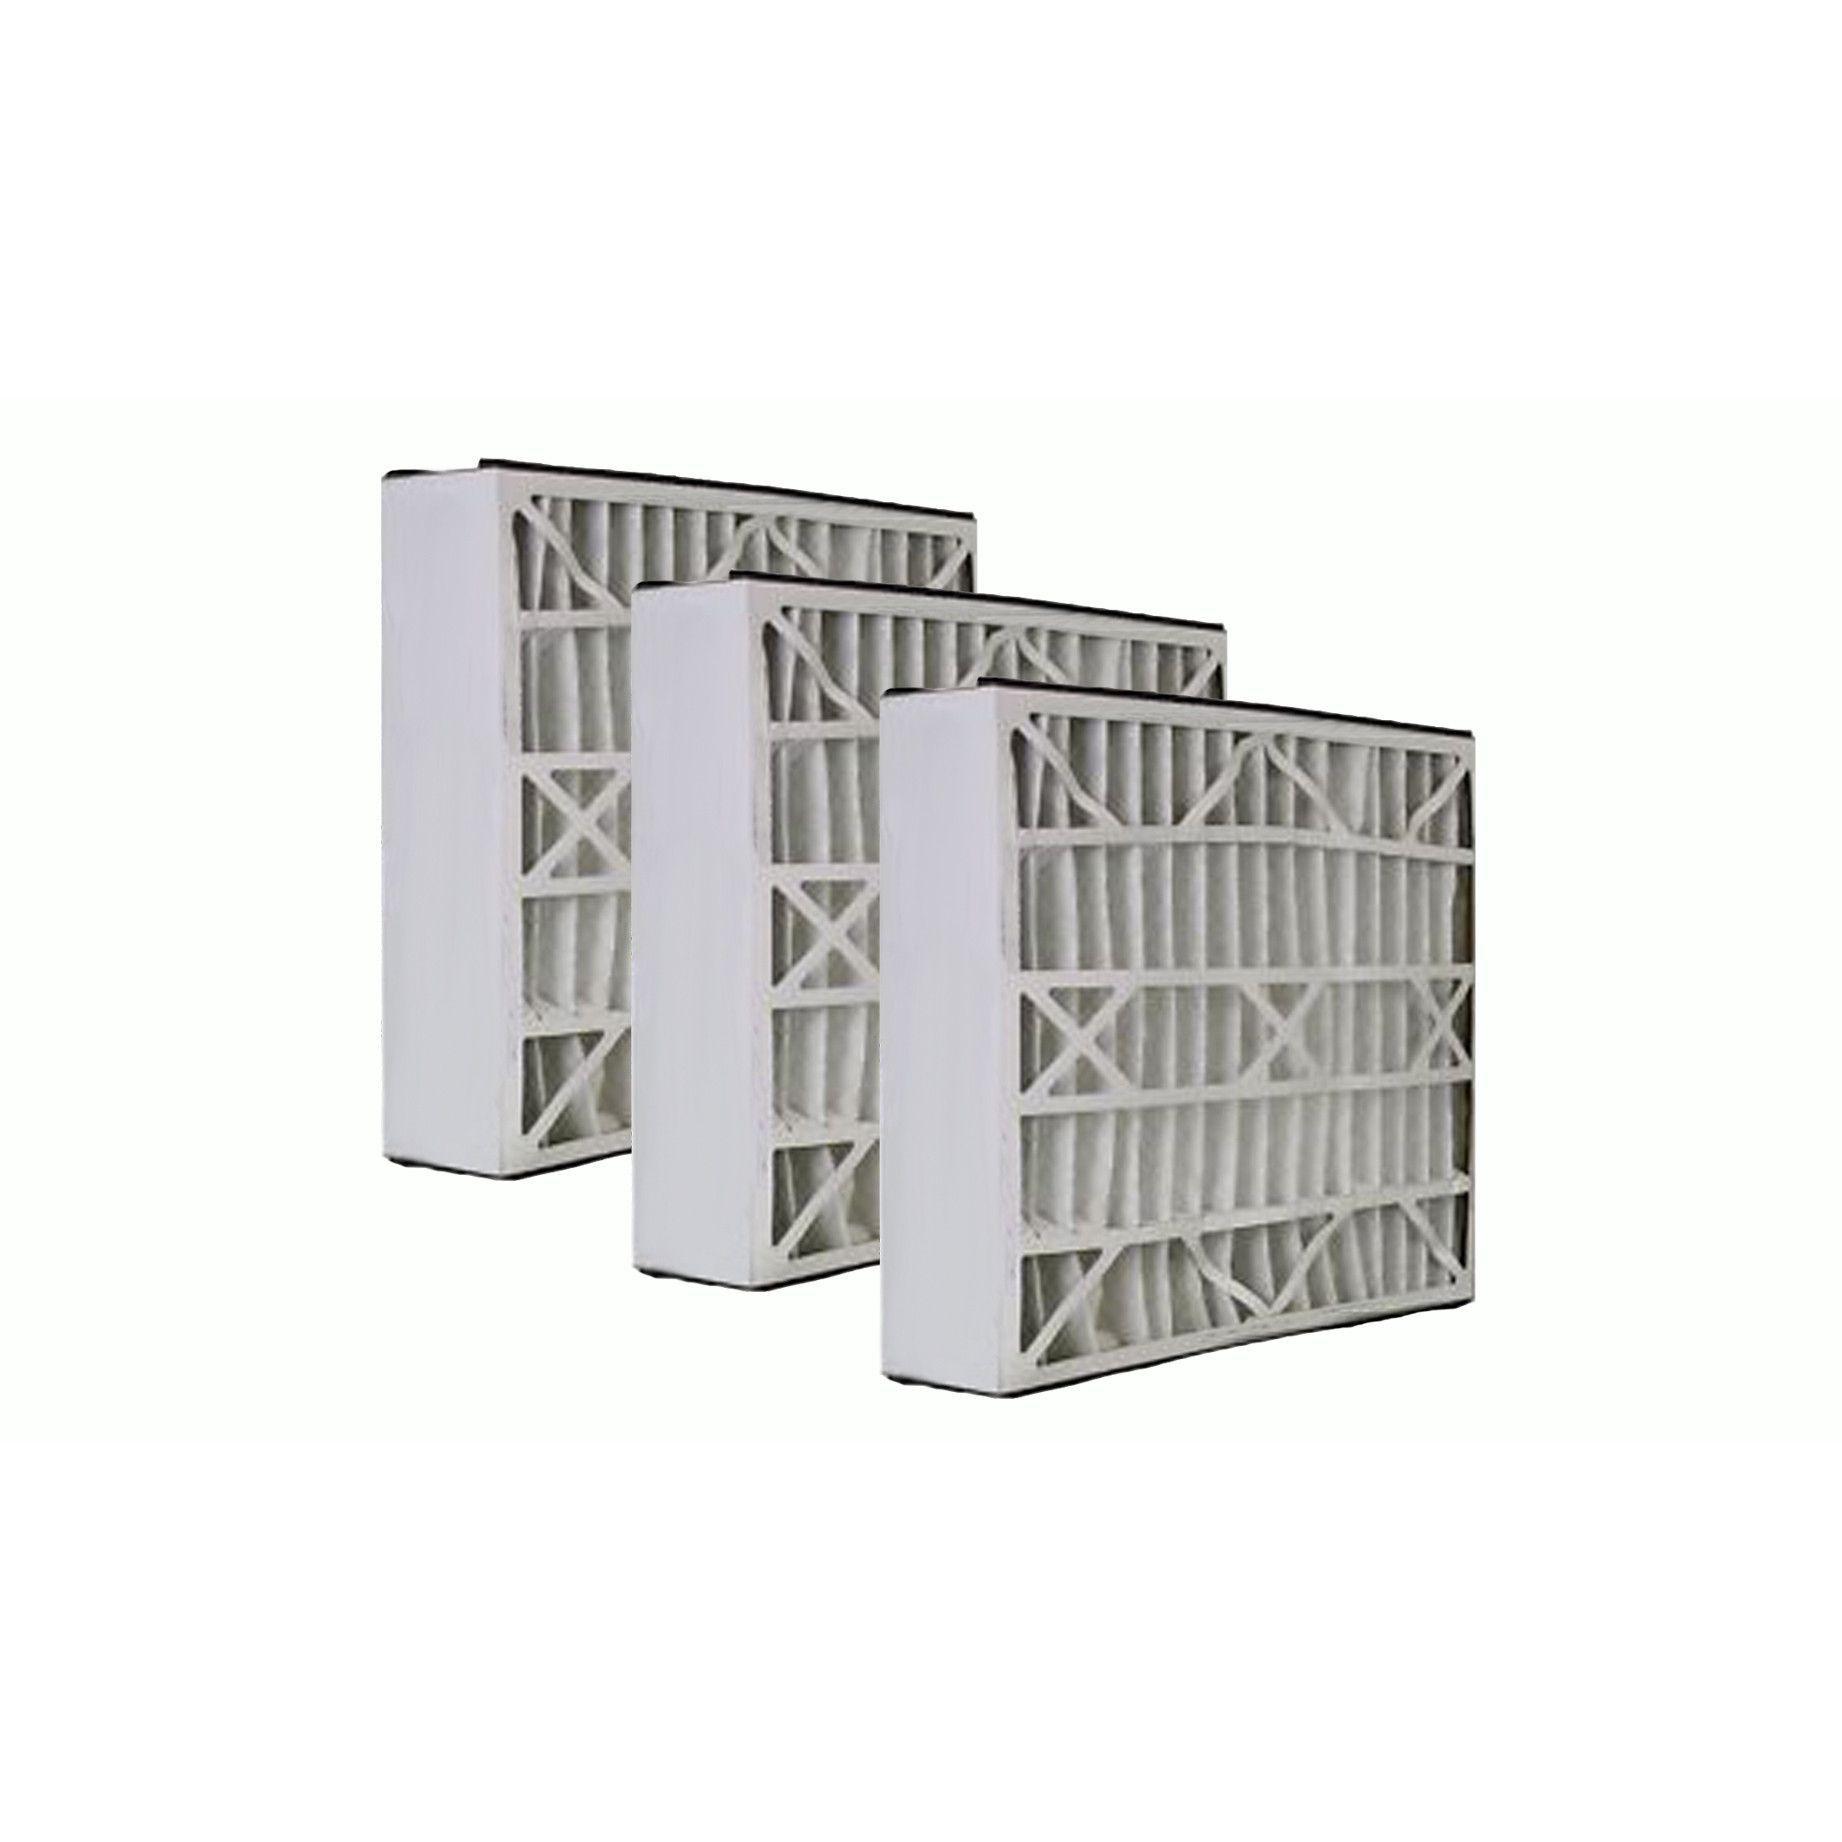 Goal Furnace filters, Hvac furnace, Hvac filters